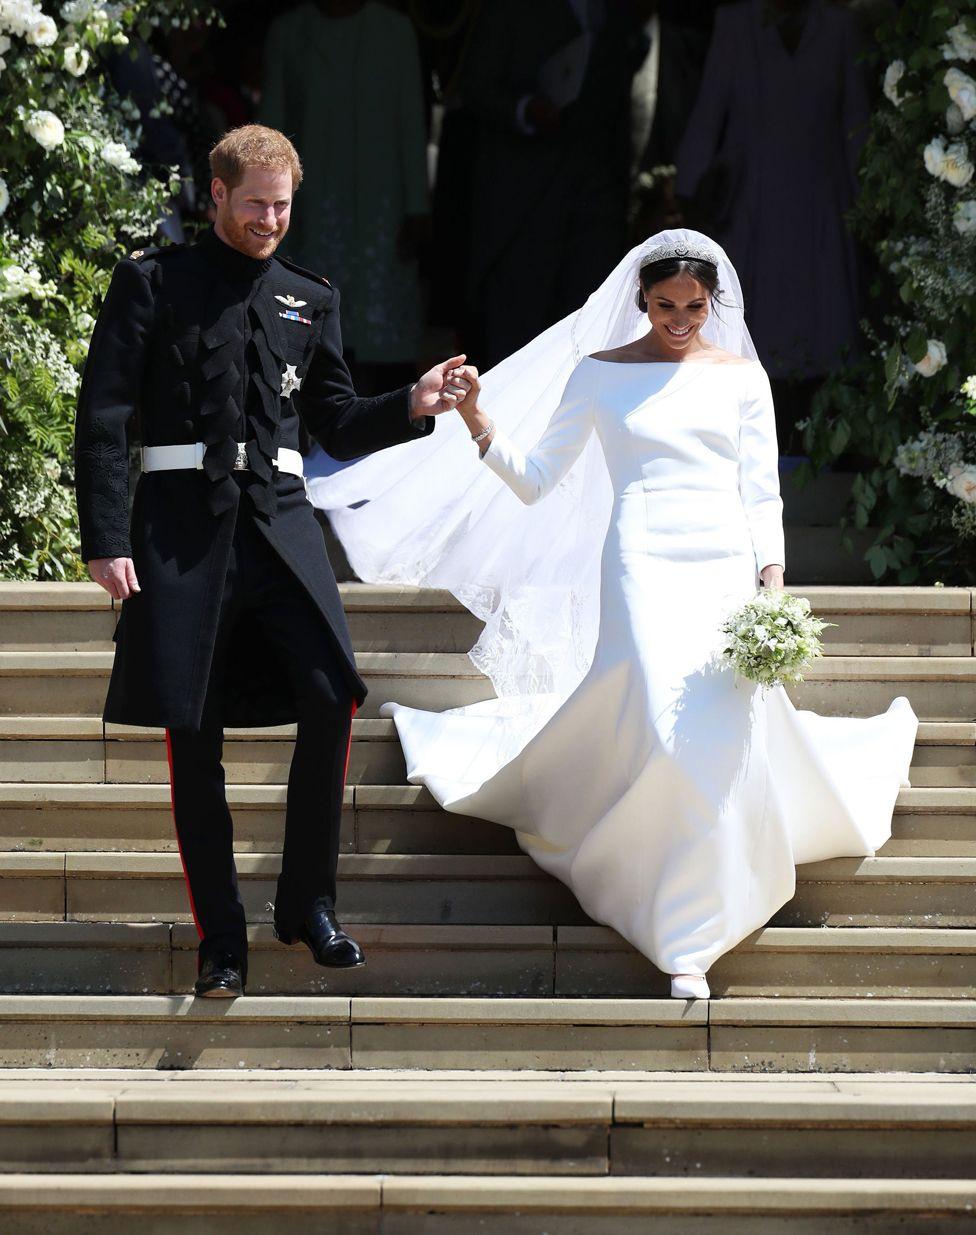 8bbacbc3955 Meghan Markles wedding dress by Clare Waight Keller of Givenchy - Meghan  Markle s Wedding Dress